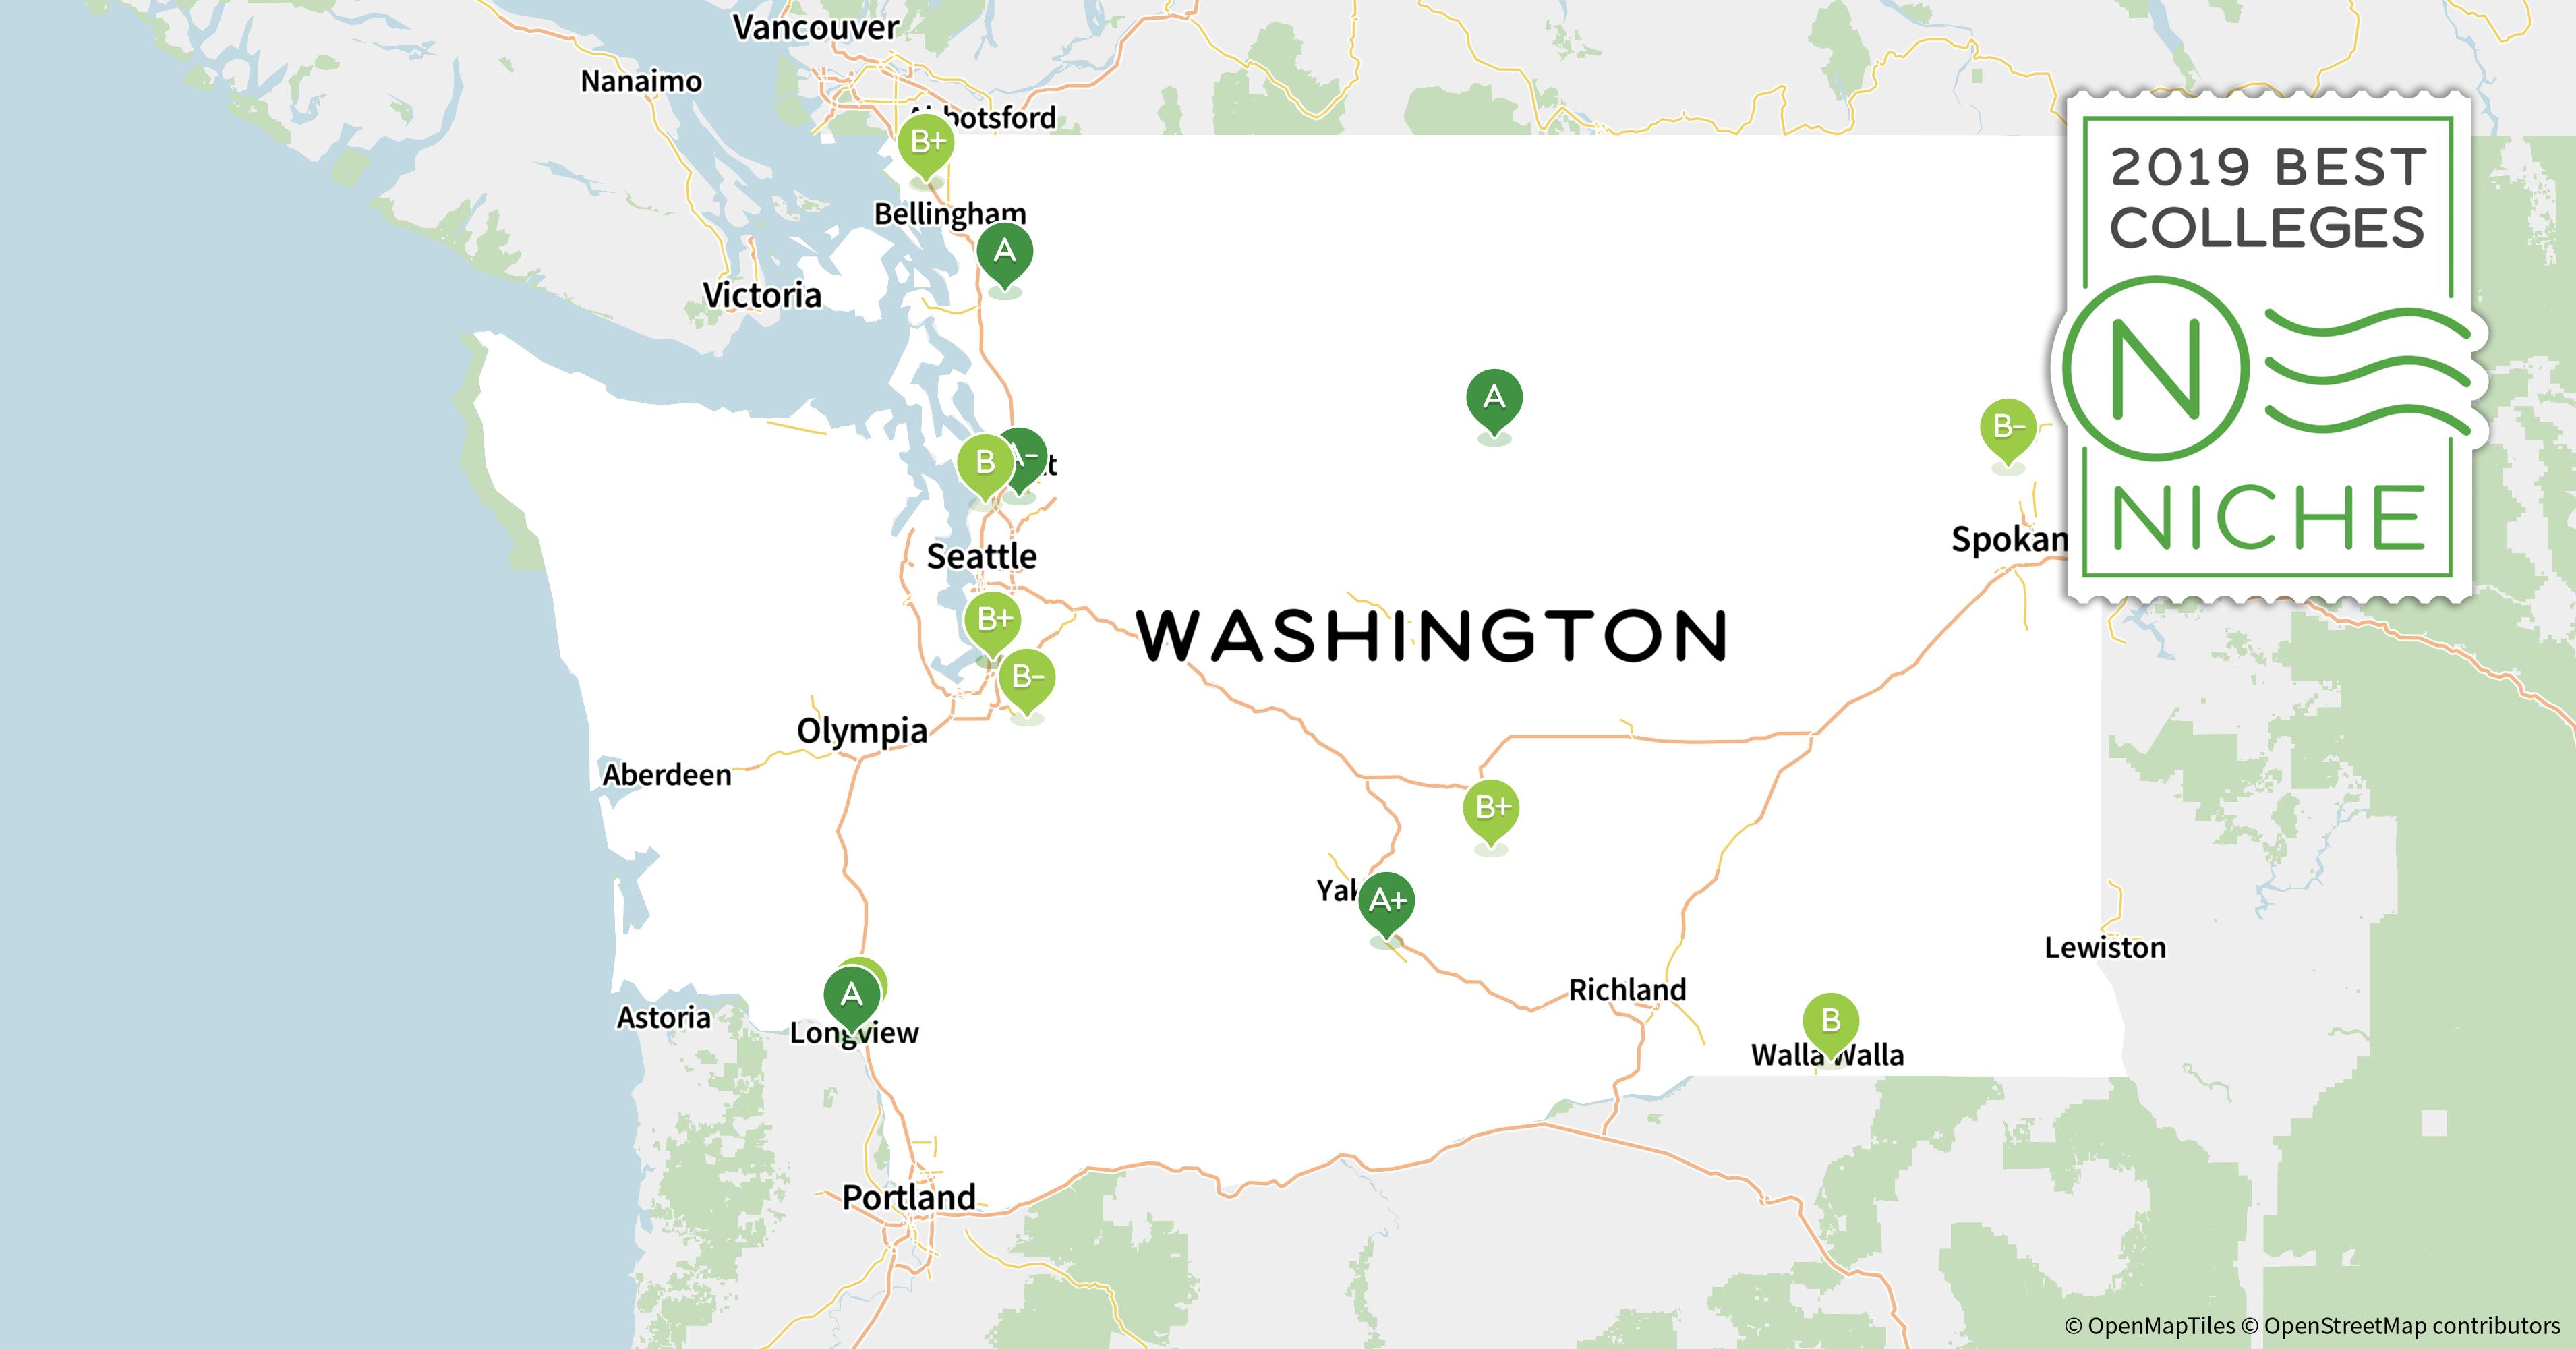 2020 Top Graduate Programs In Washington Niche